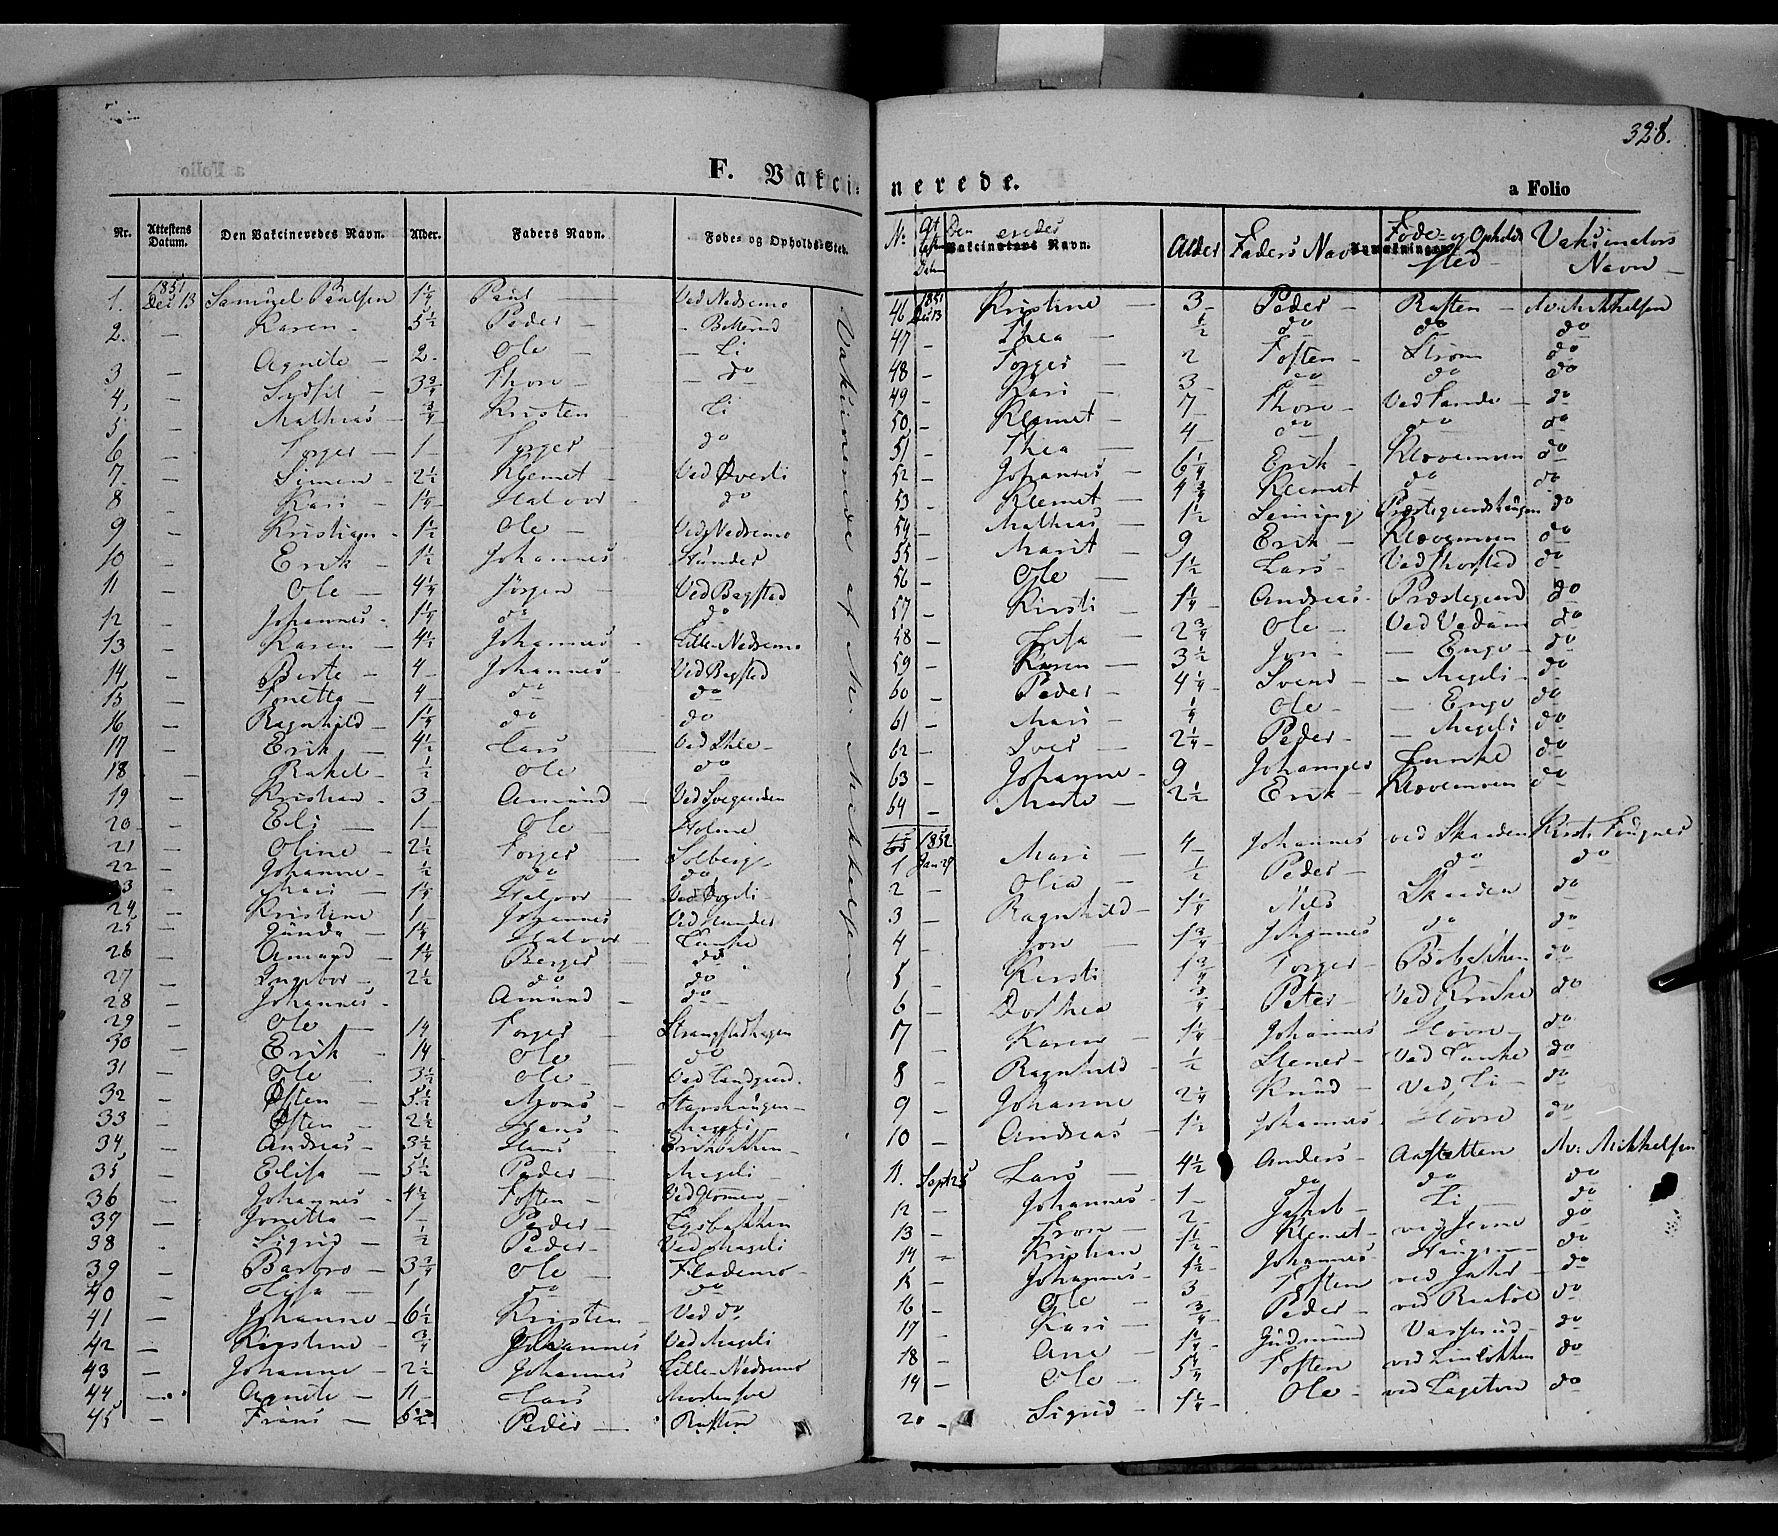 SAH, Øyer prestekontor, Ministerialbok nr. 5, 1842-1857, s. 328